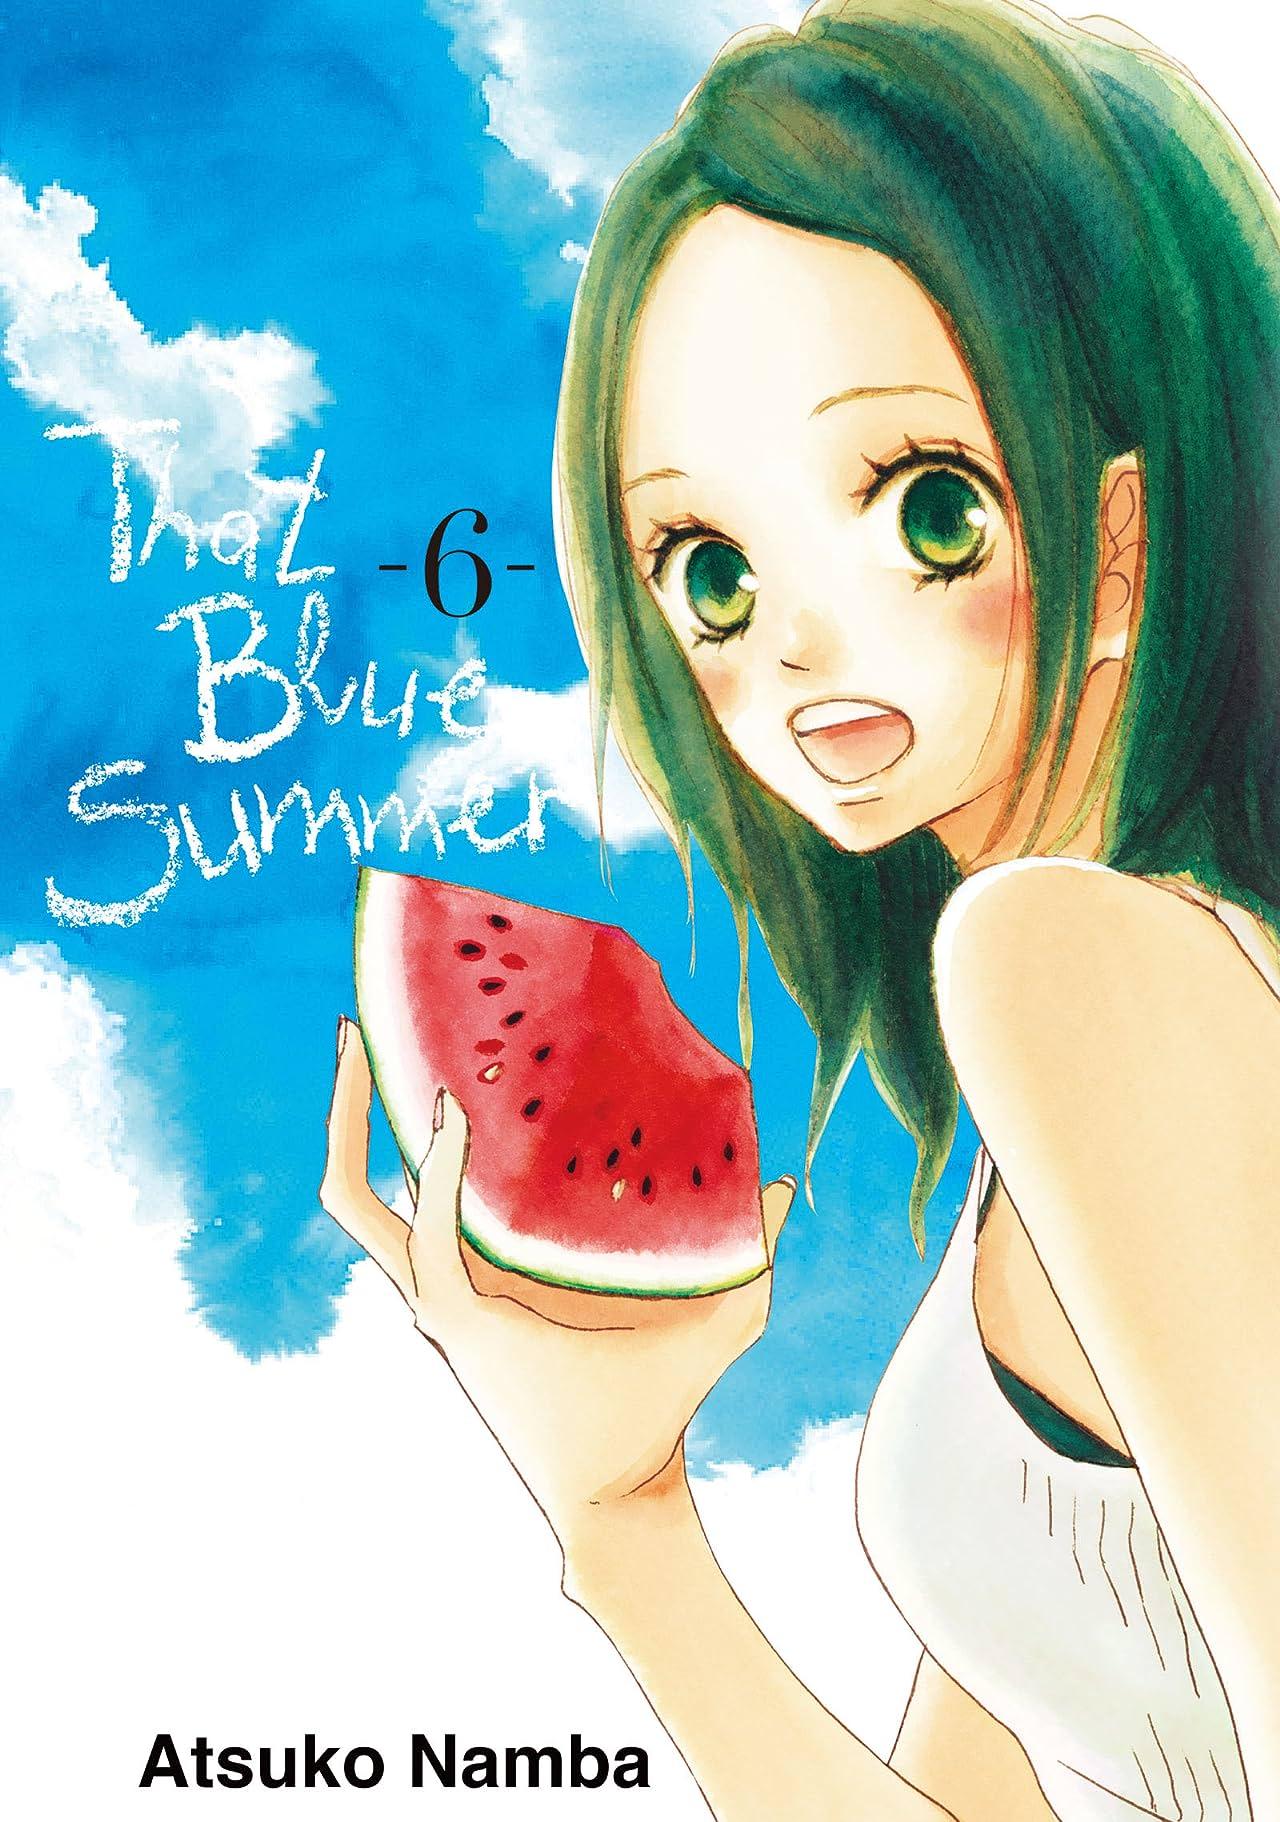 That Blue Summer Vol. 6